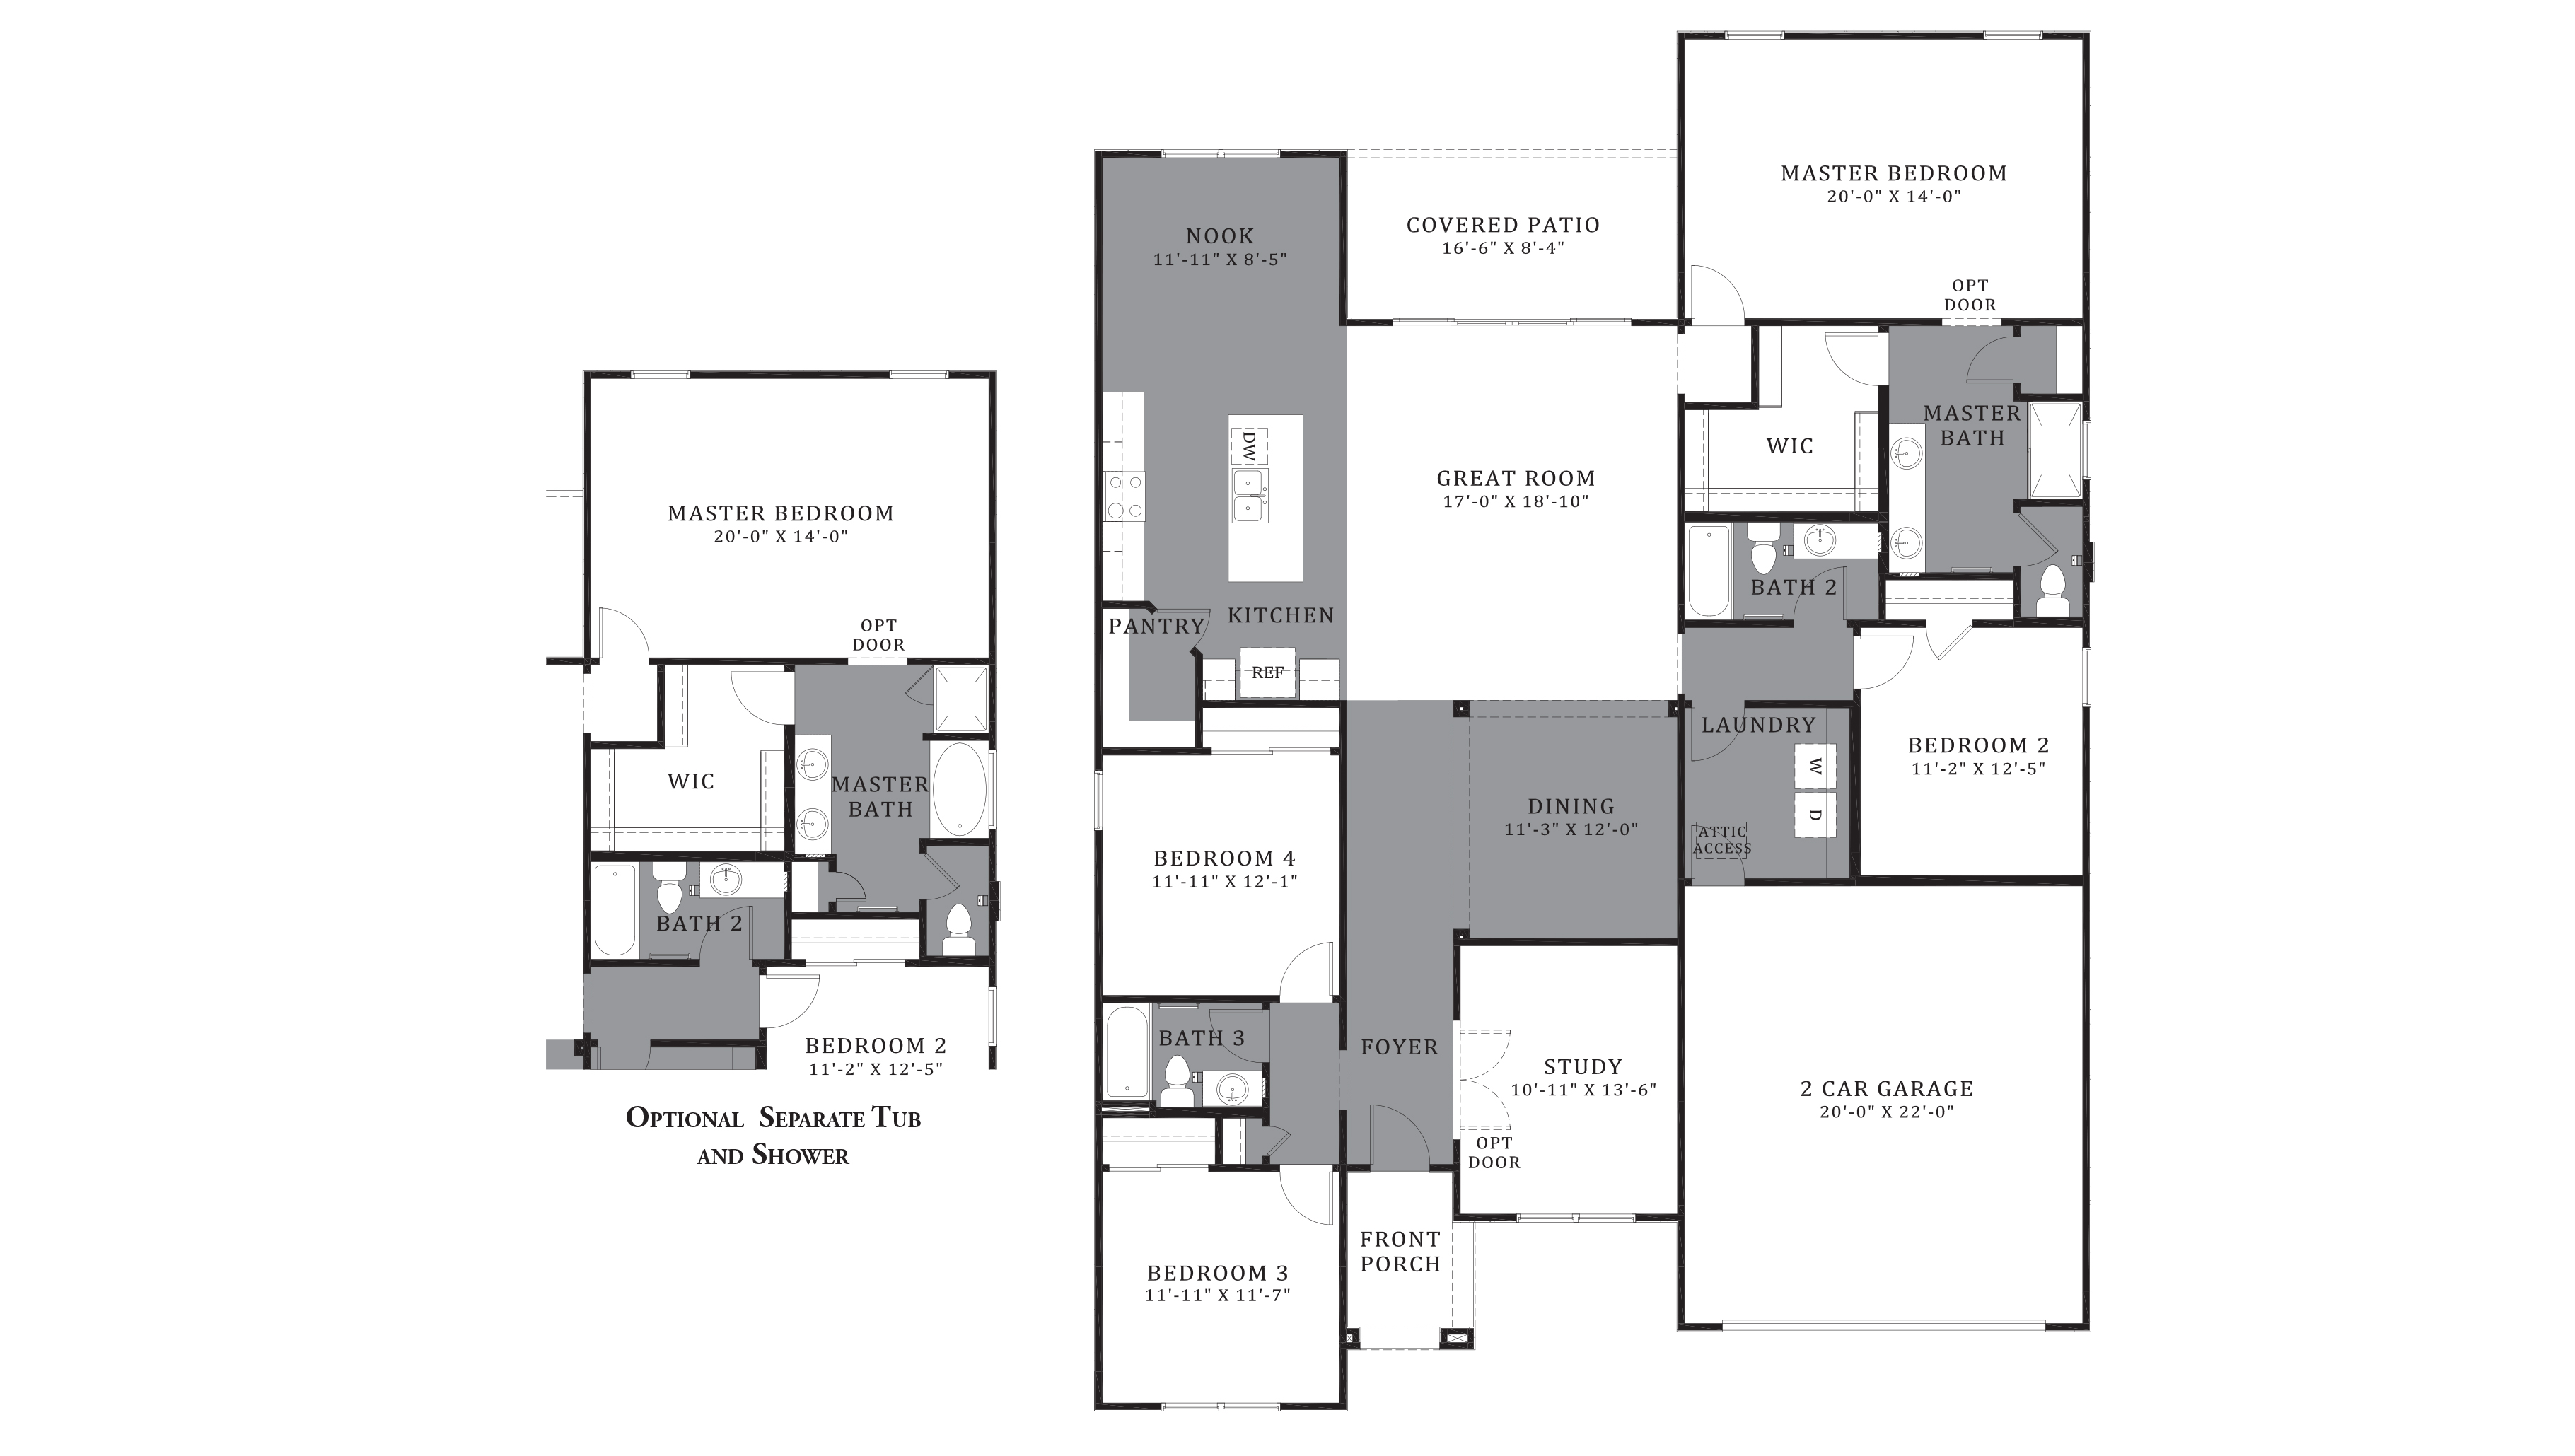 D.R. Horton Santa Cruz Meadows Pearl - Plan 5032 Floor Plan